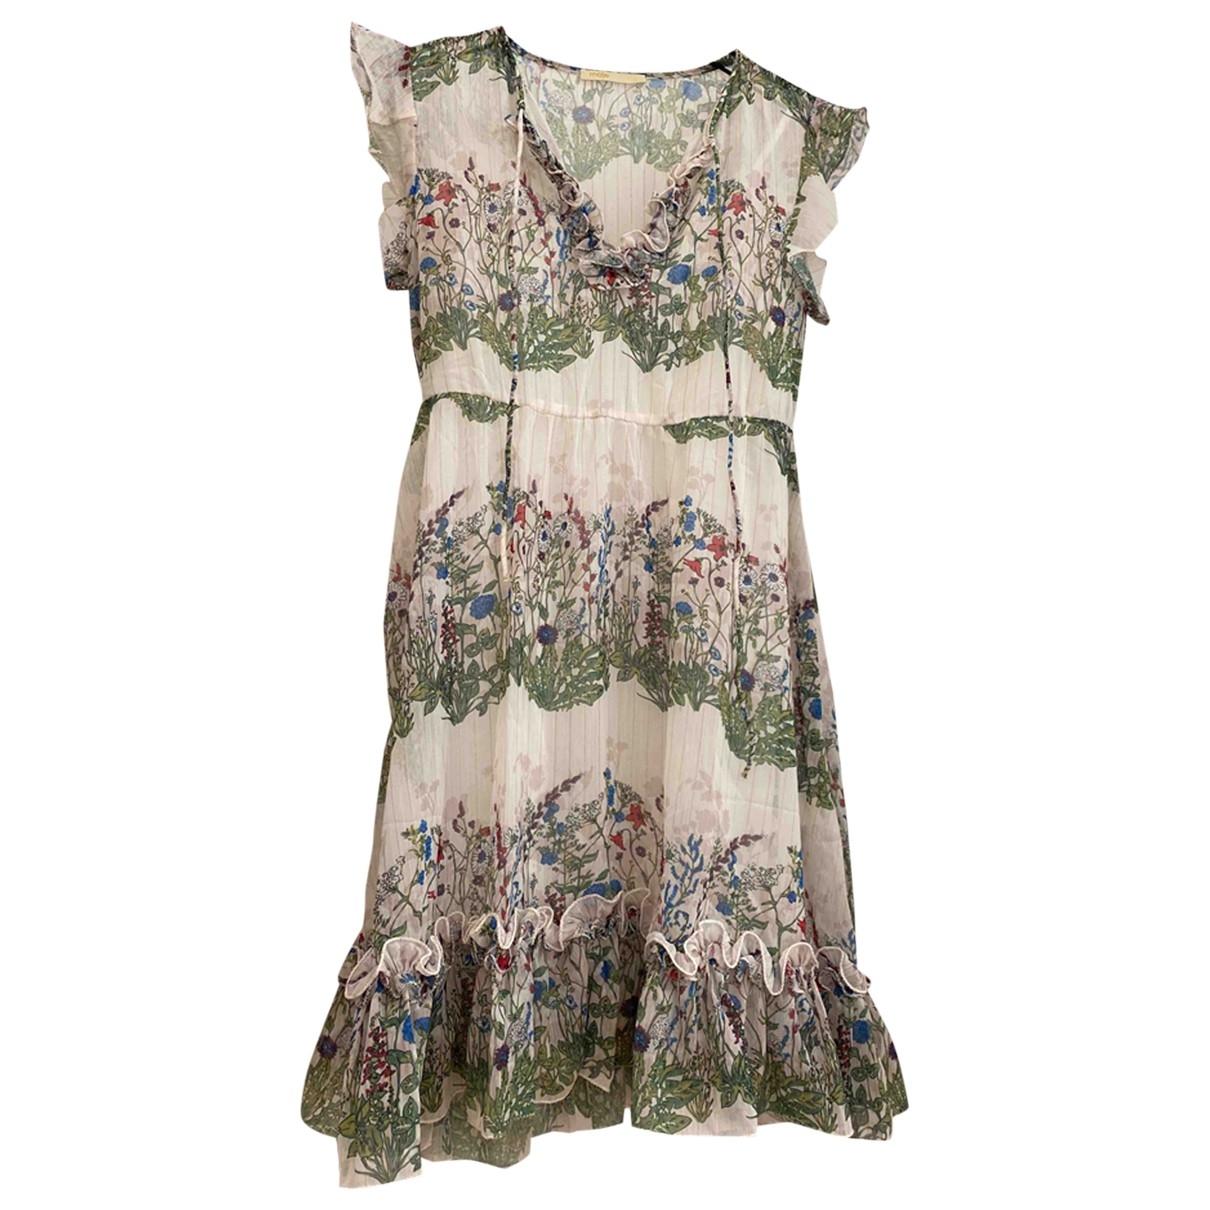 Maje Spring Summer 2020 Kleid in  Ecru Baumwolle